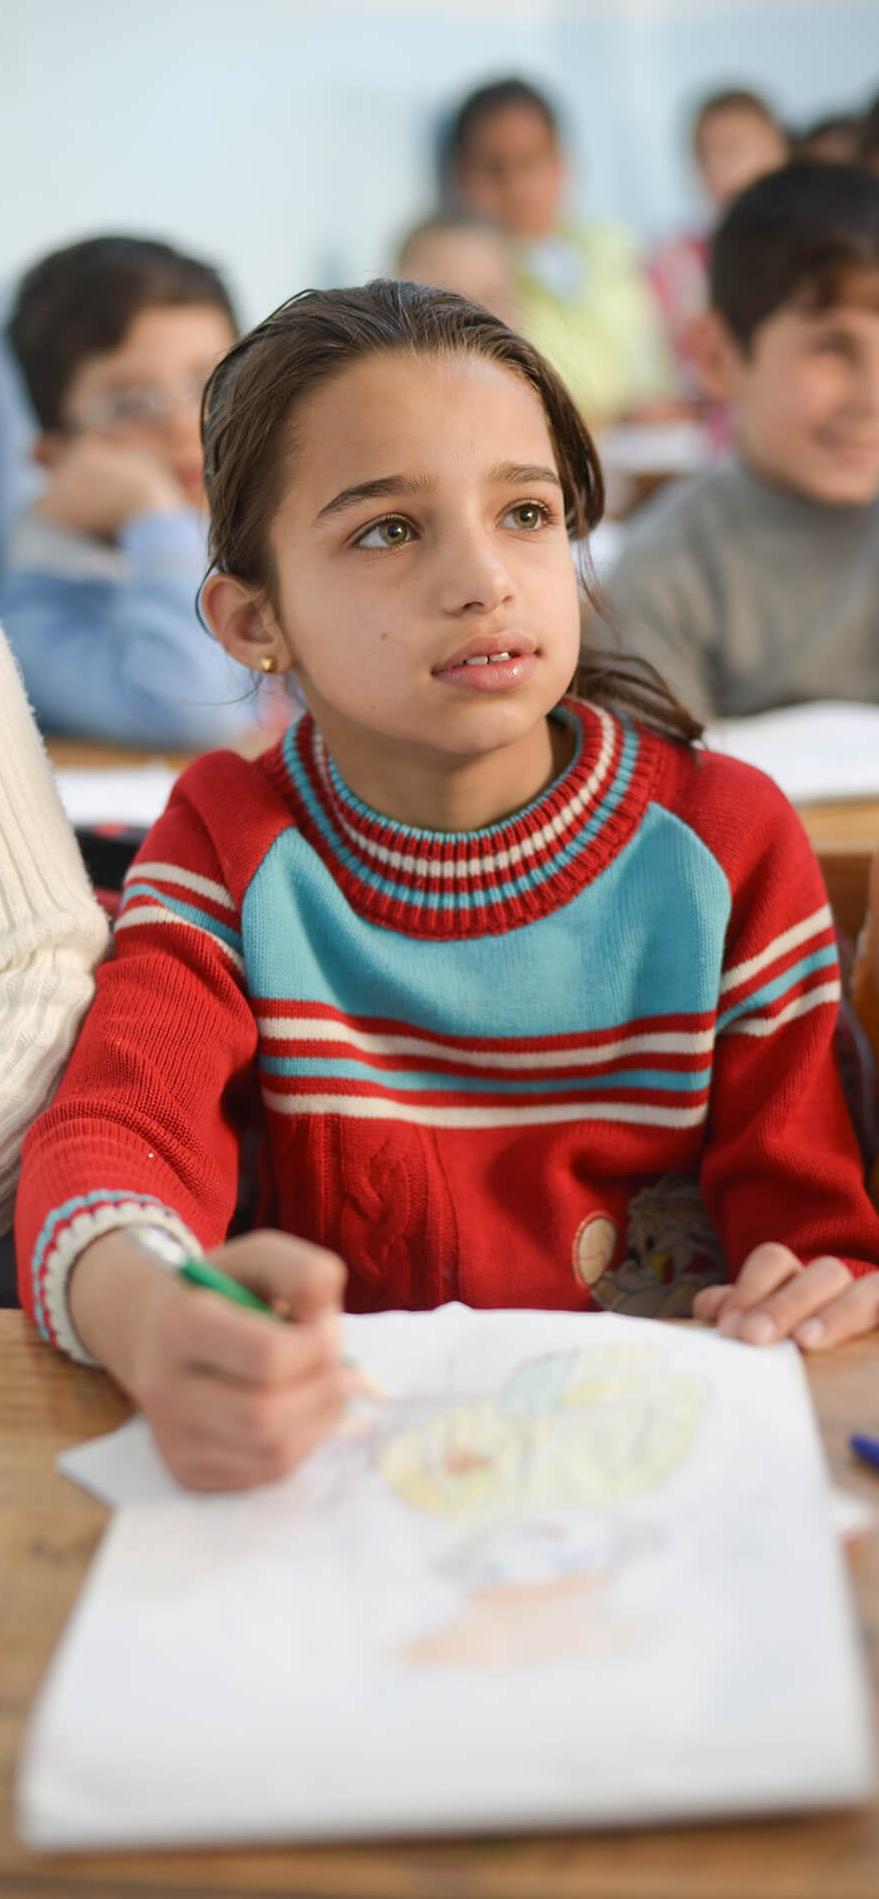 samer-muscati-syria-9371.jpg